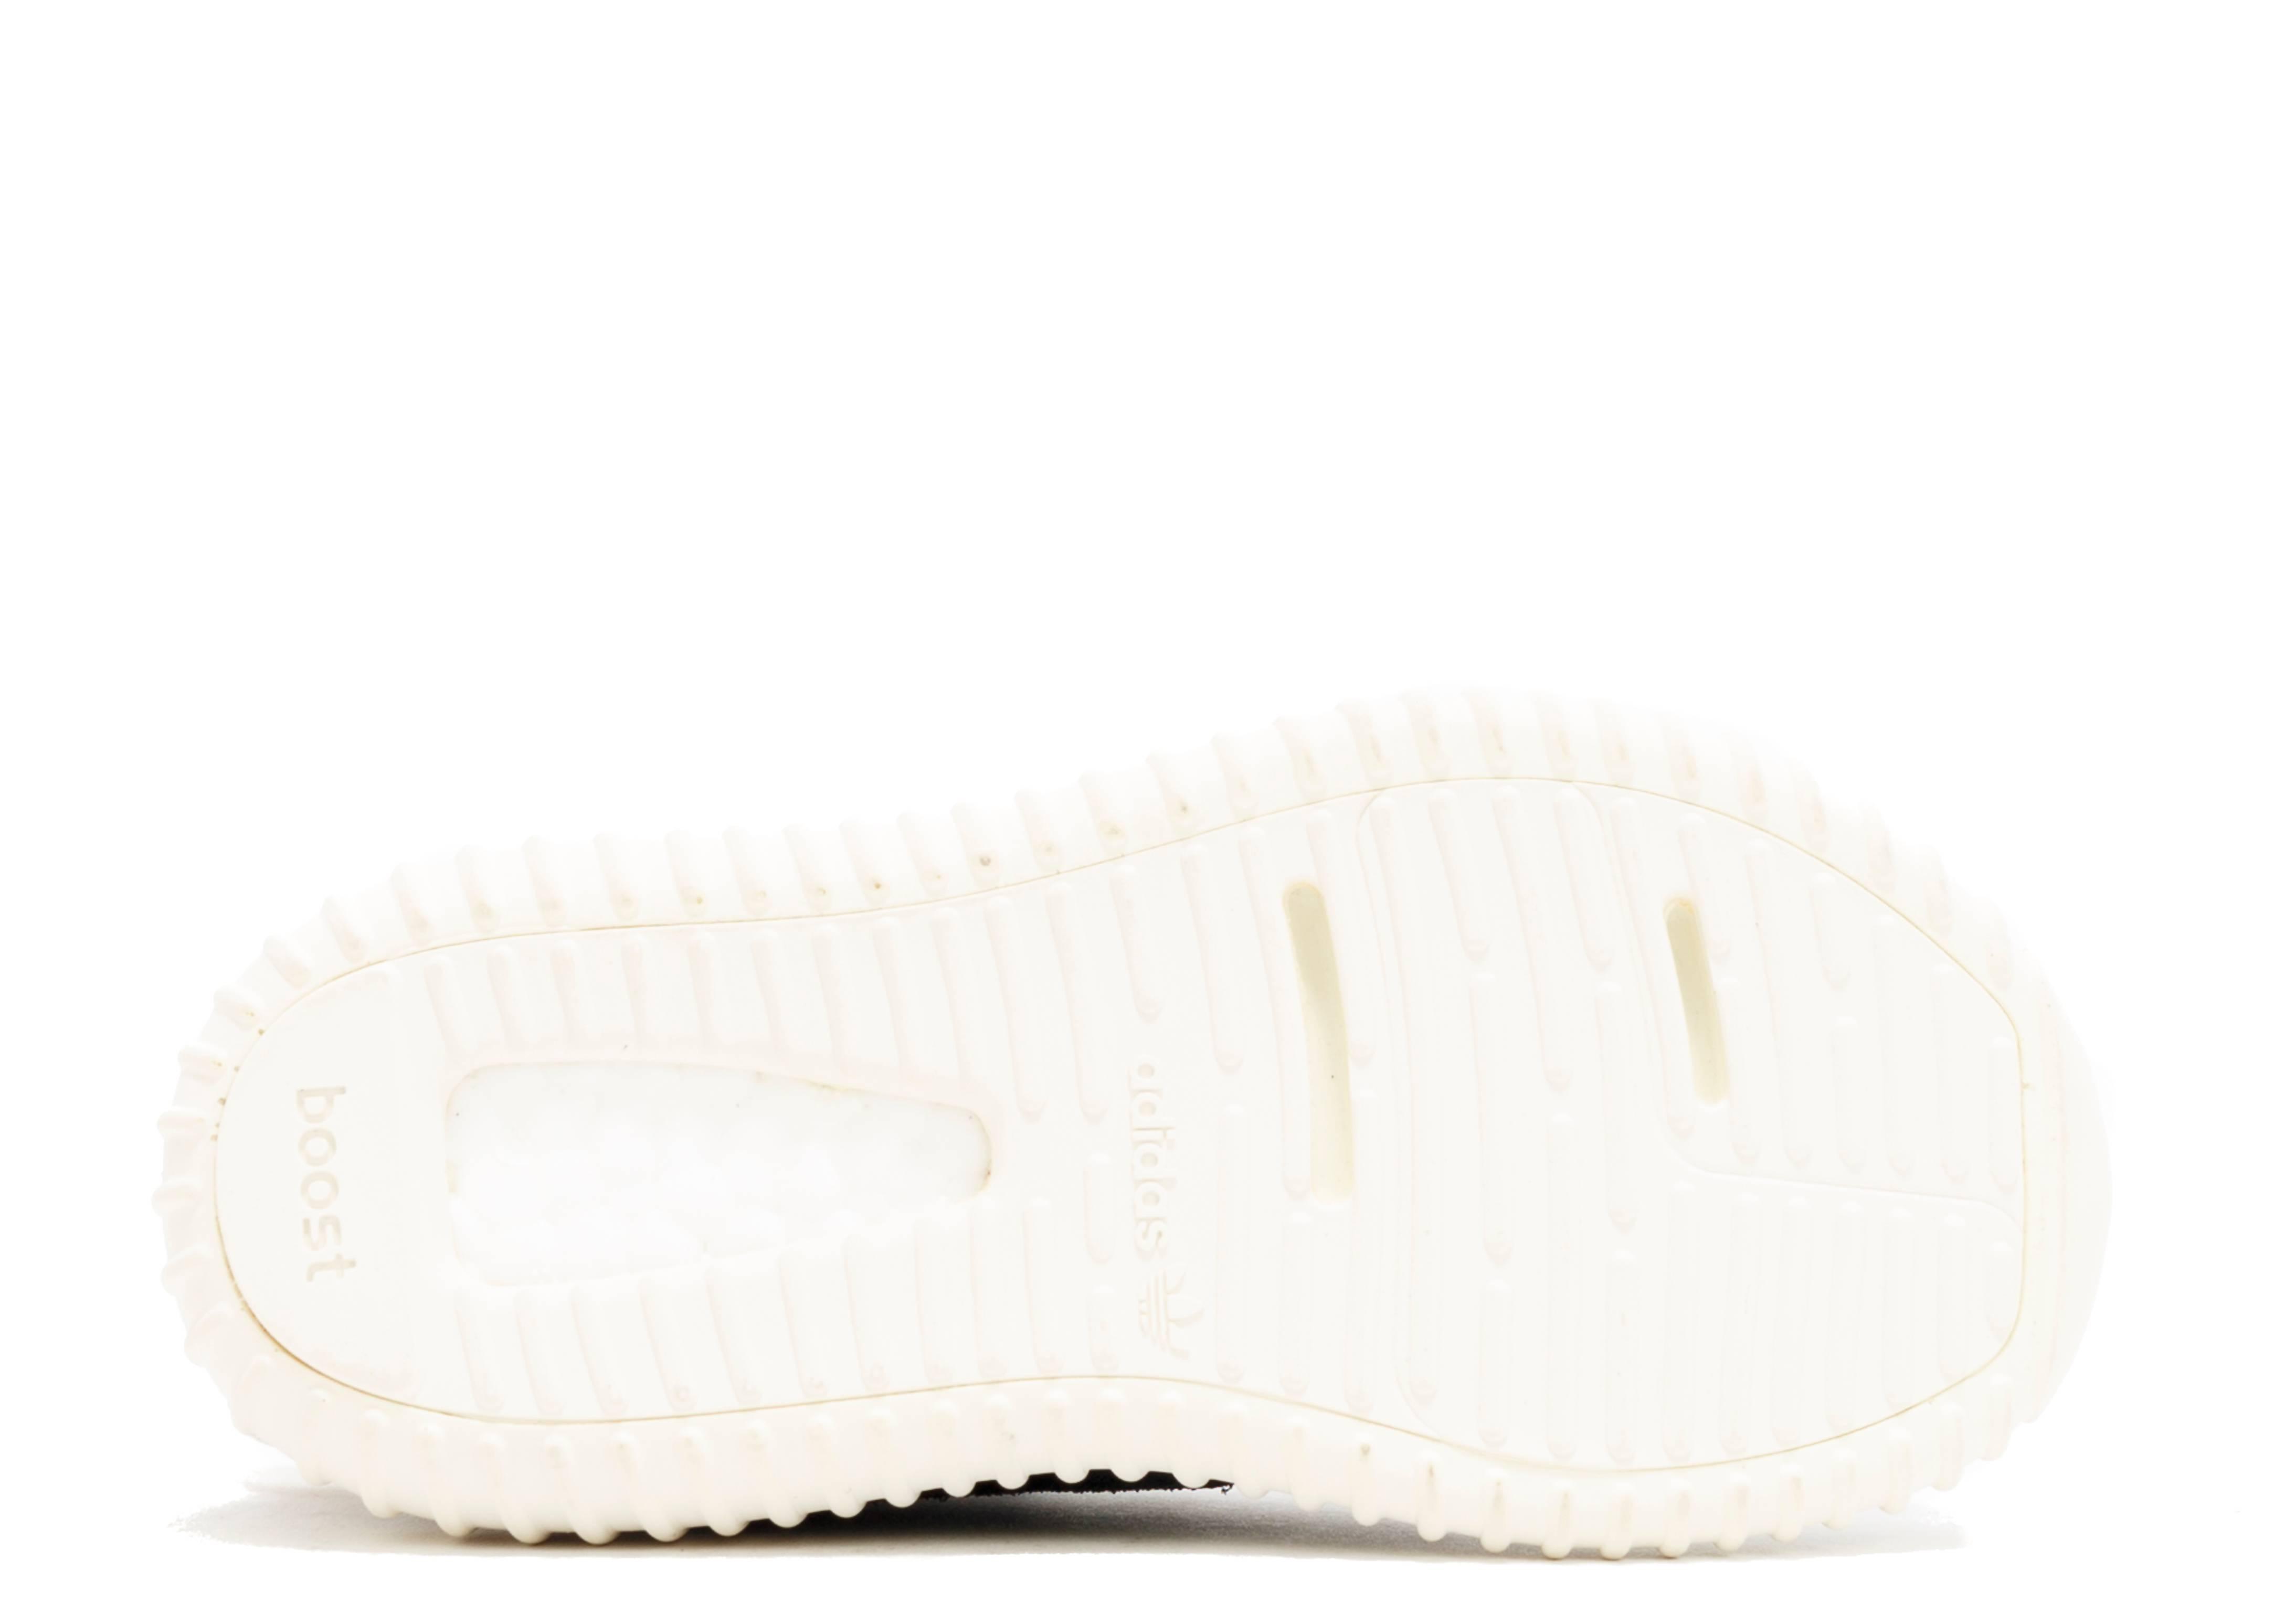 42453ae40 Adidas Yeezy Boost 350 Turtledove Infant (I) - 4